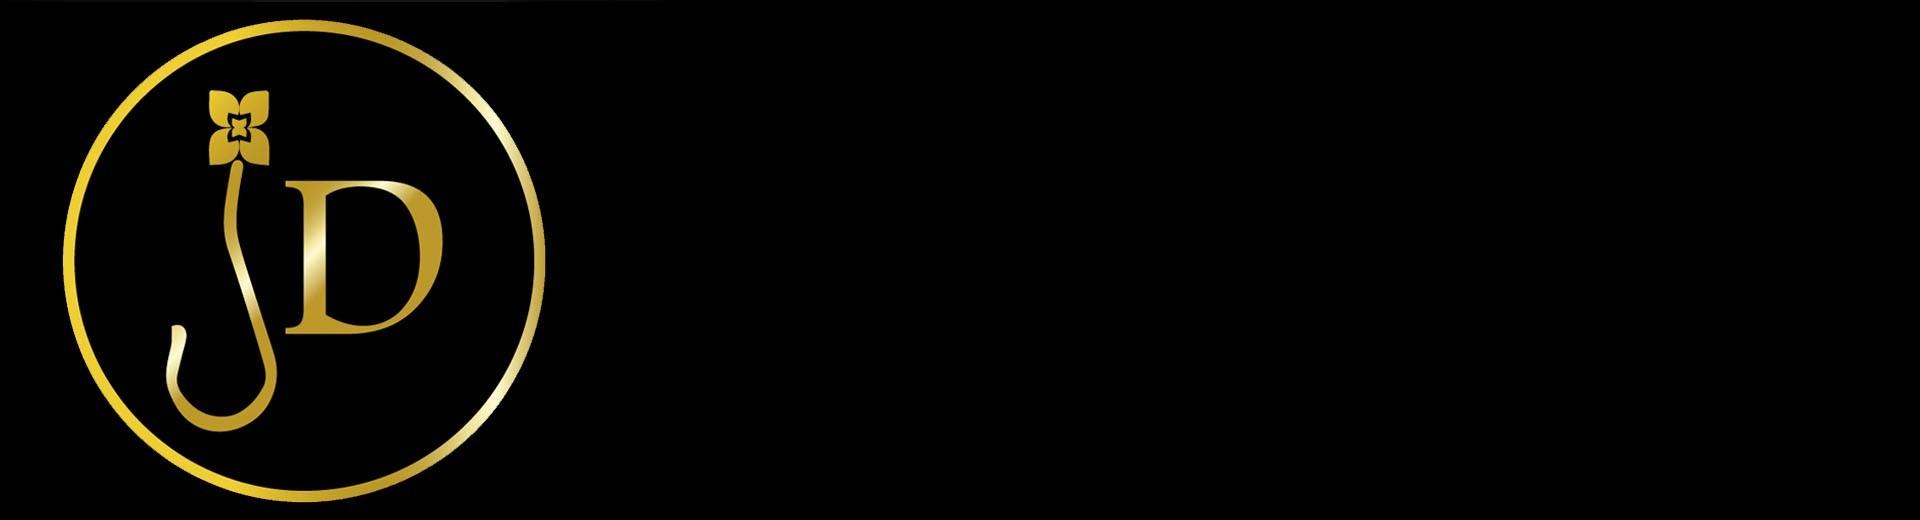 OUTLET PLATA